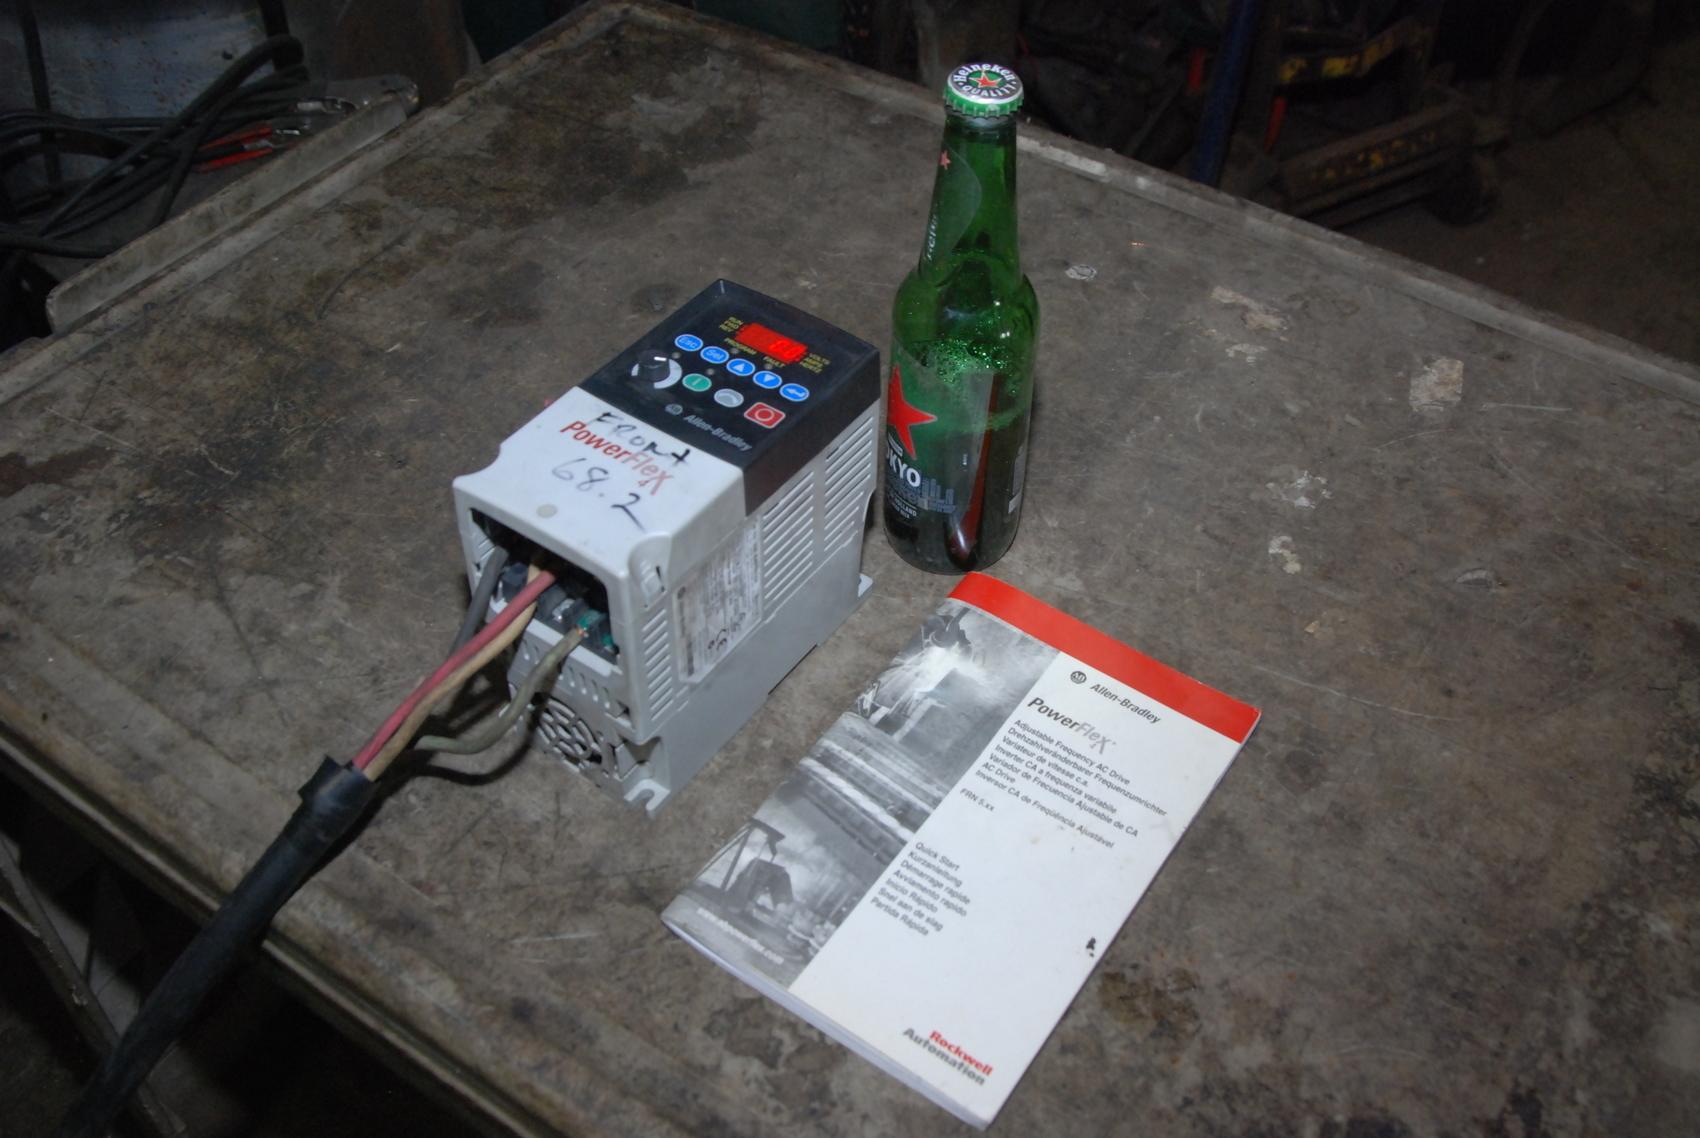 Allen-Bradley PowerFlex4 AC Drive Controller;